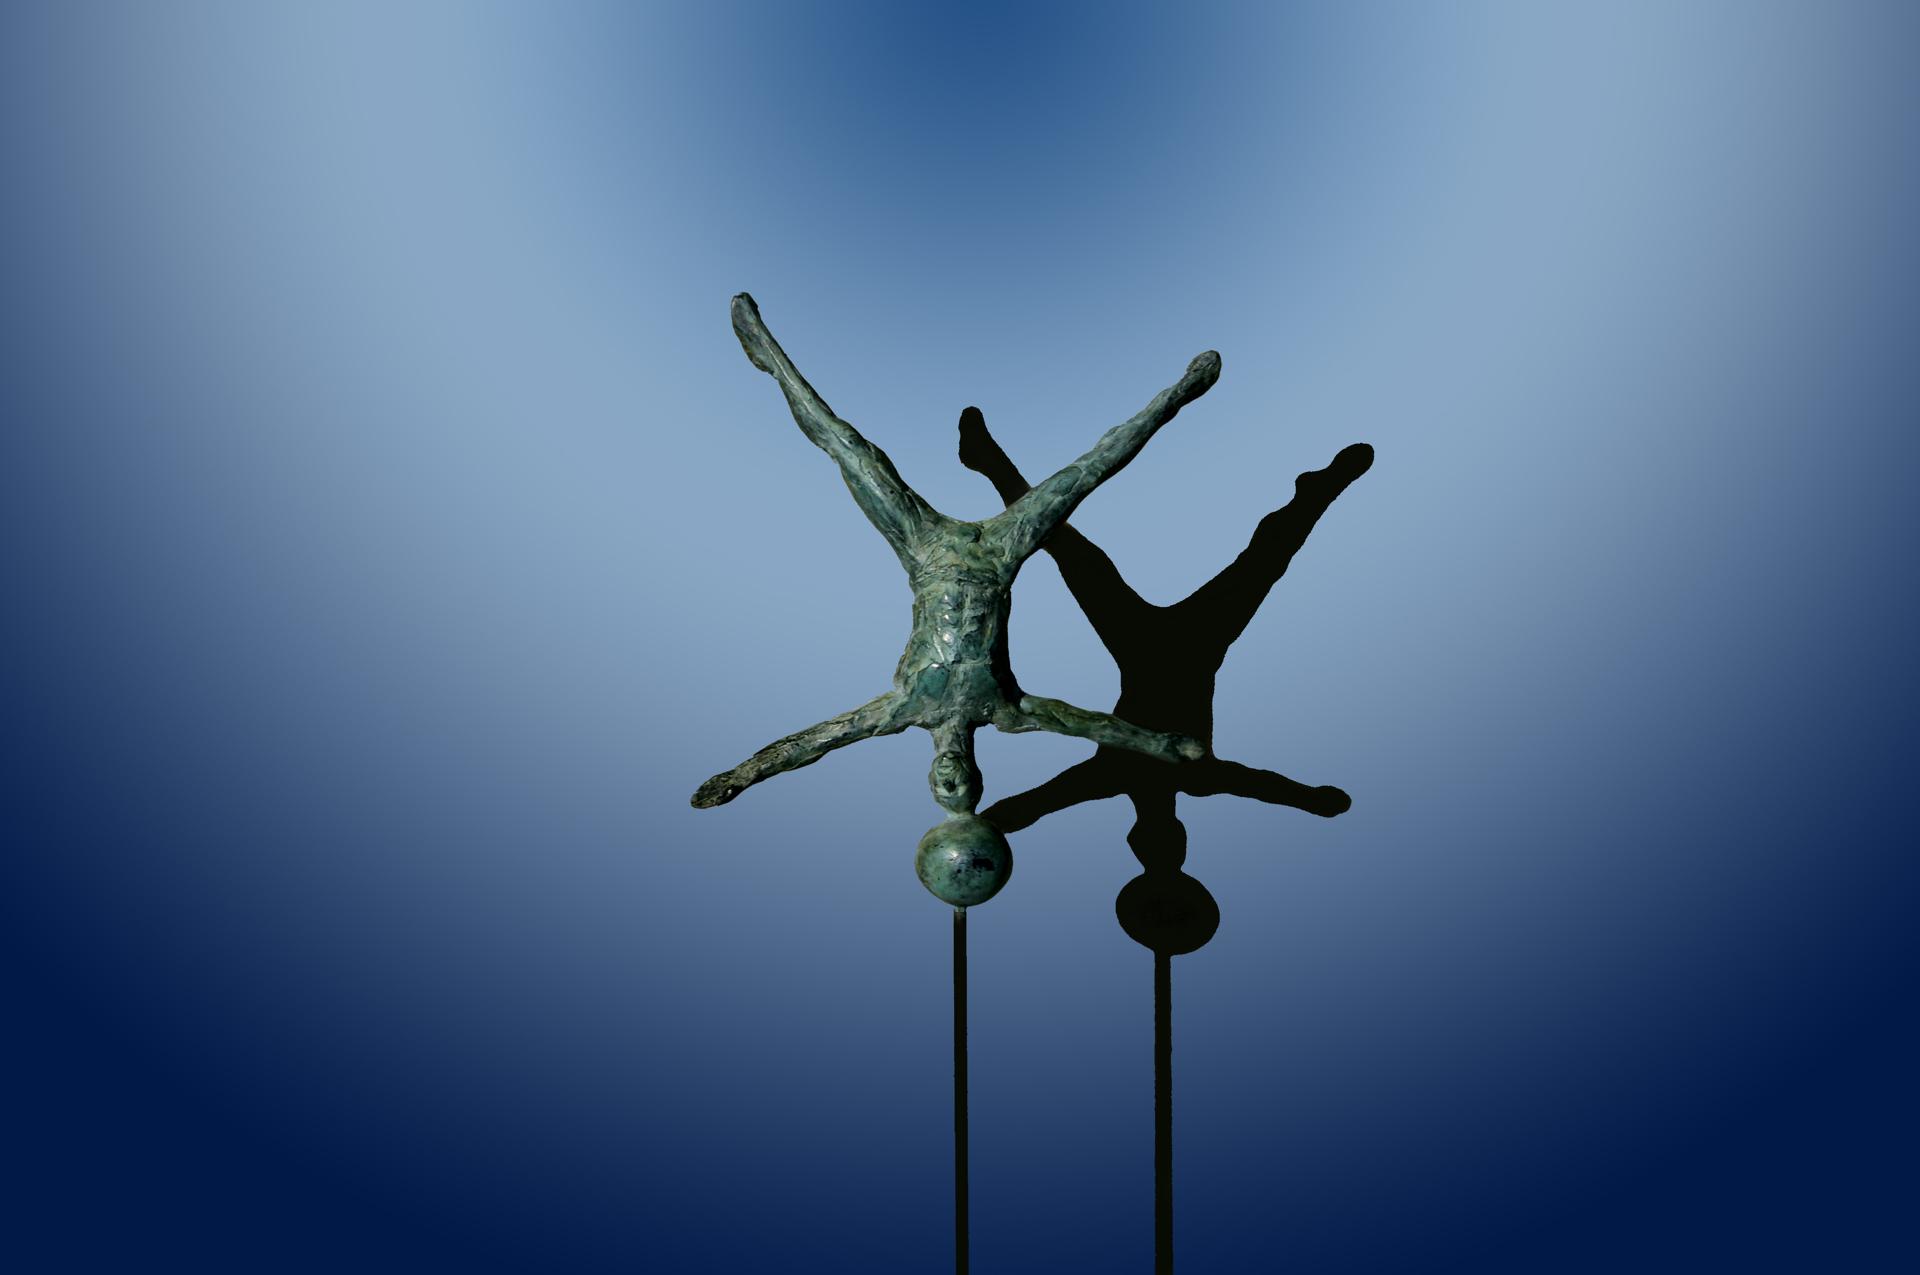 Balance Series: Headstand by Bill Starke